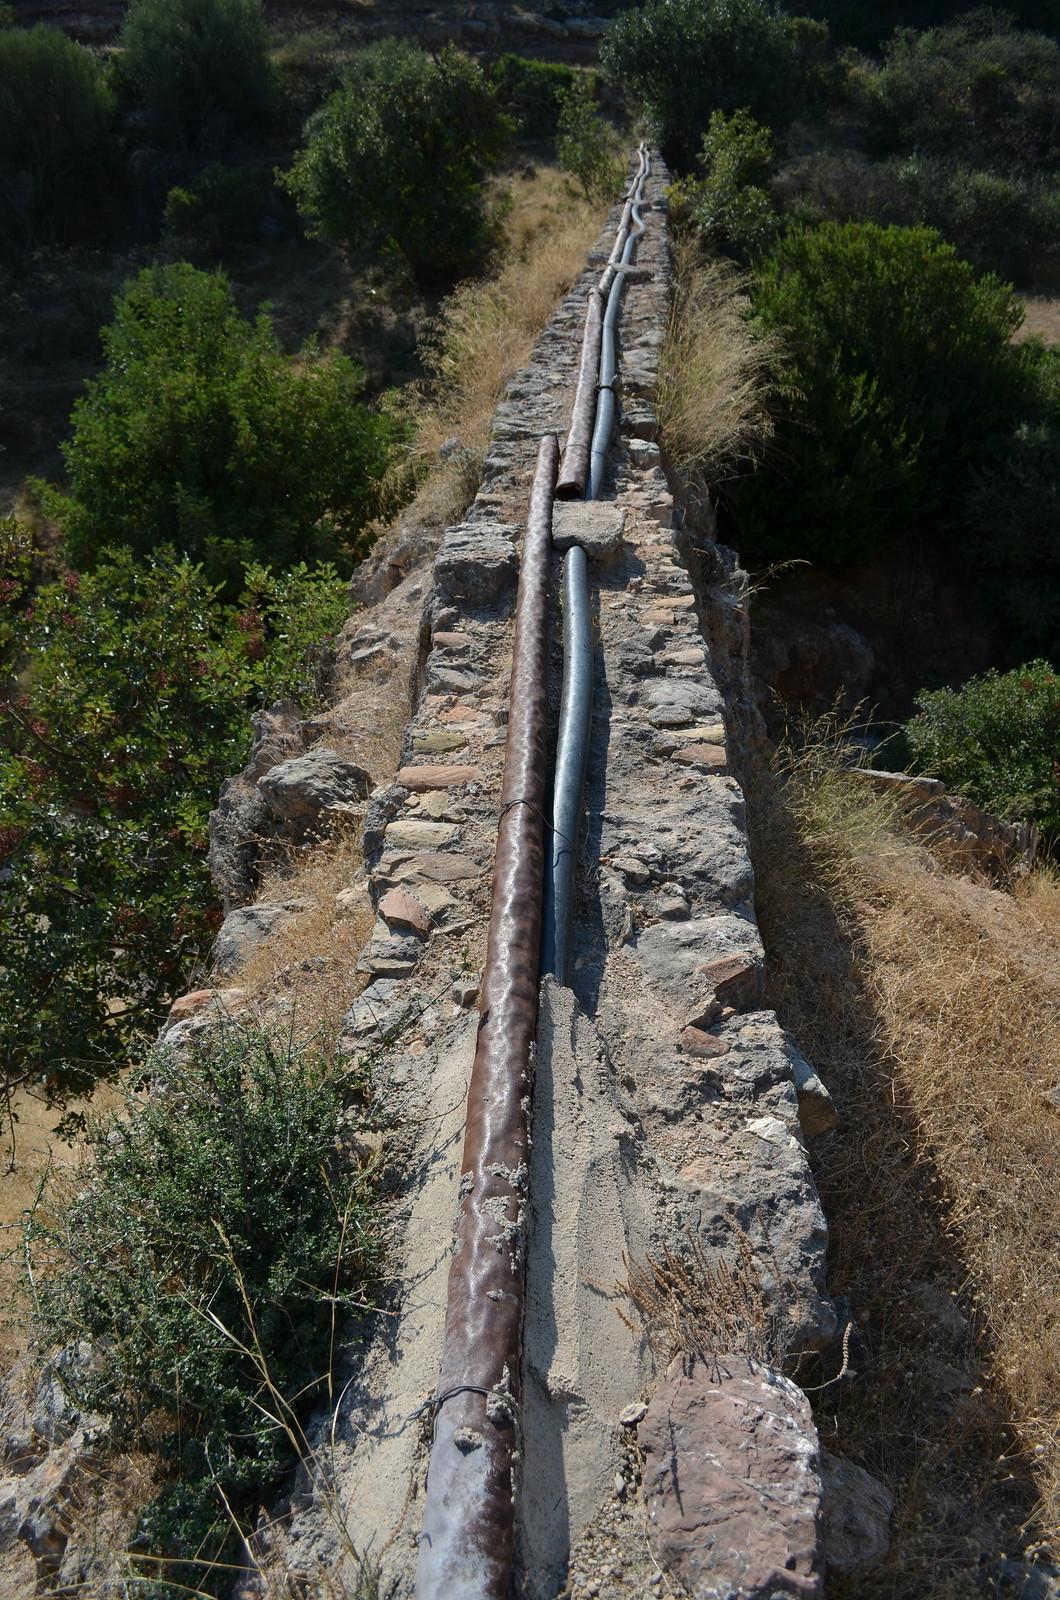 Loukou: Roman aqueduct bridge 8, modern water pipes, looking SE